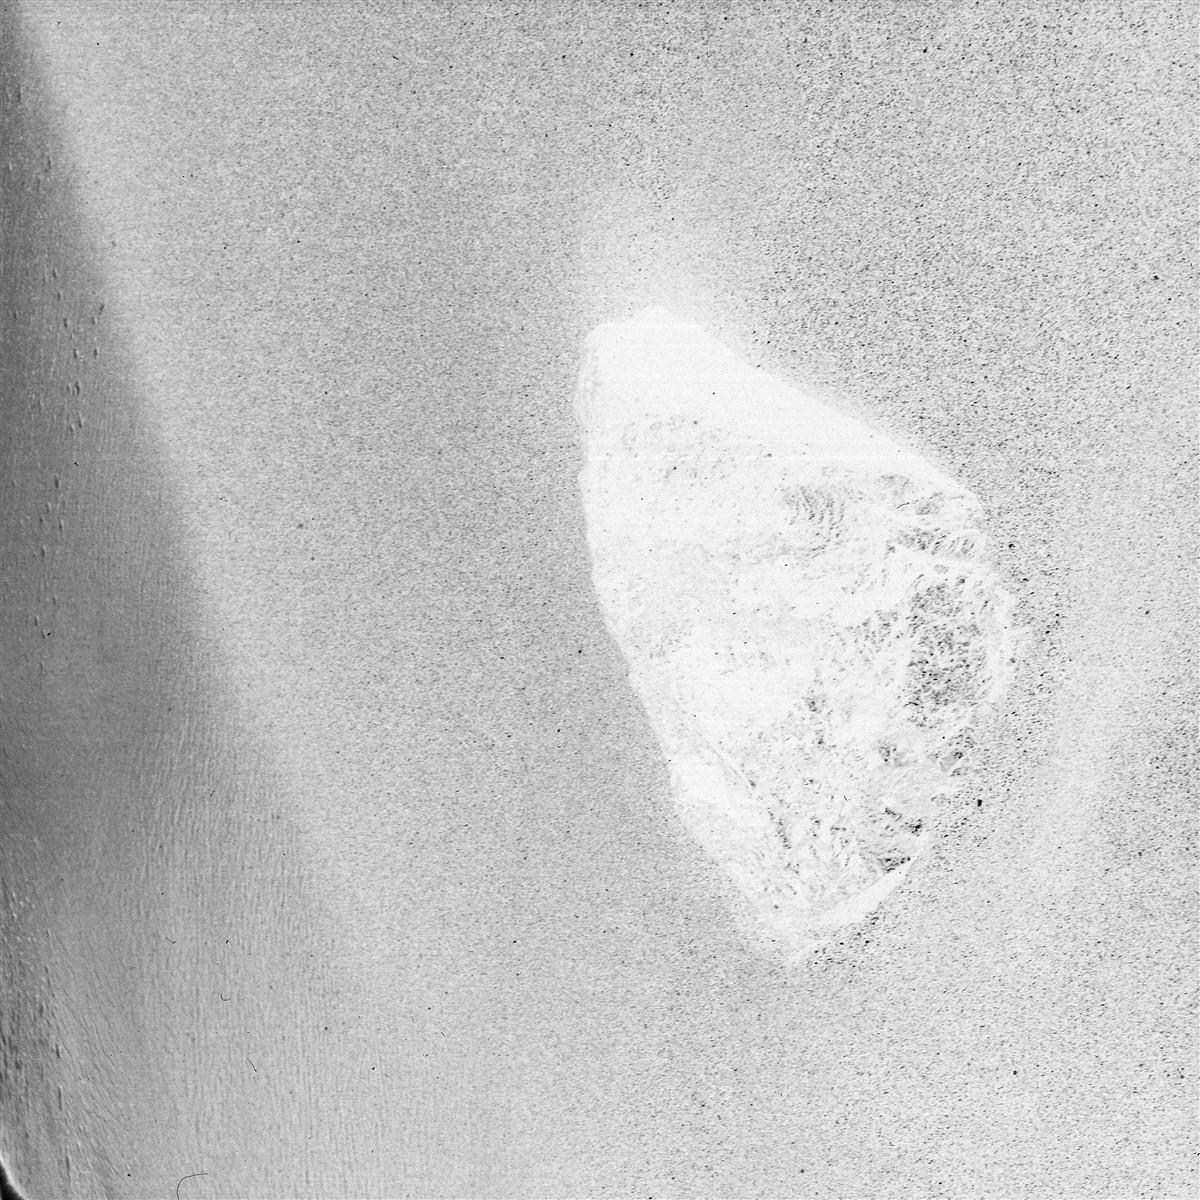 Riccardo Squillantini, Satellite, Martian Age series